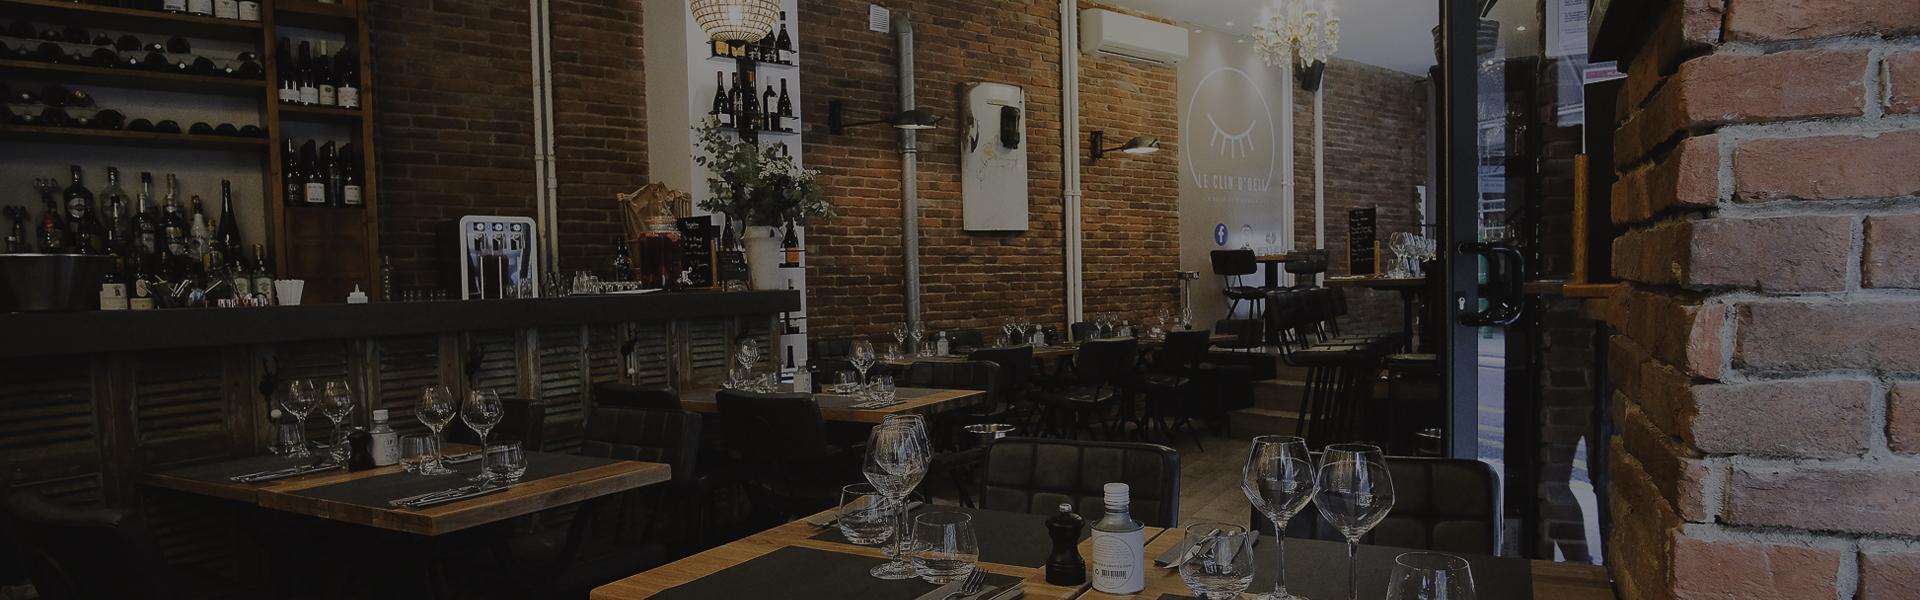 le clin d'oeil restaurant